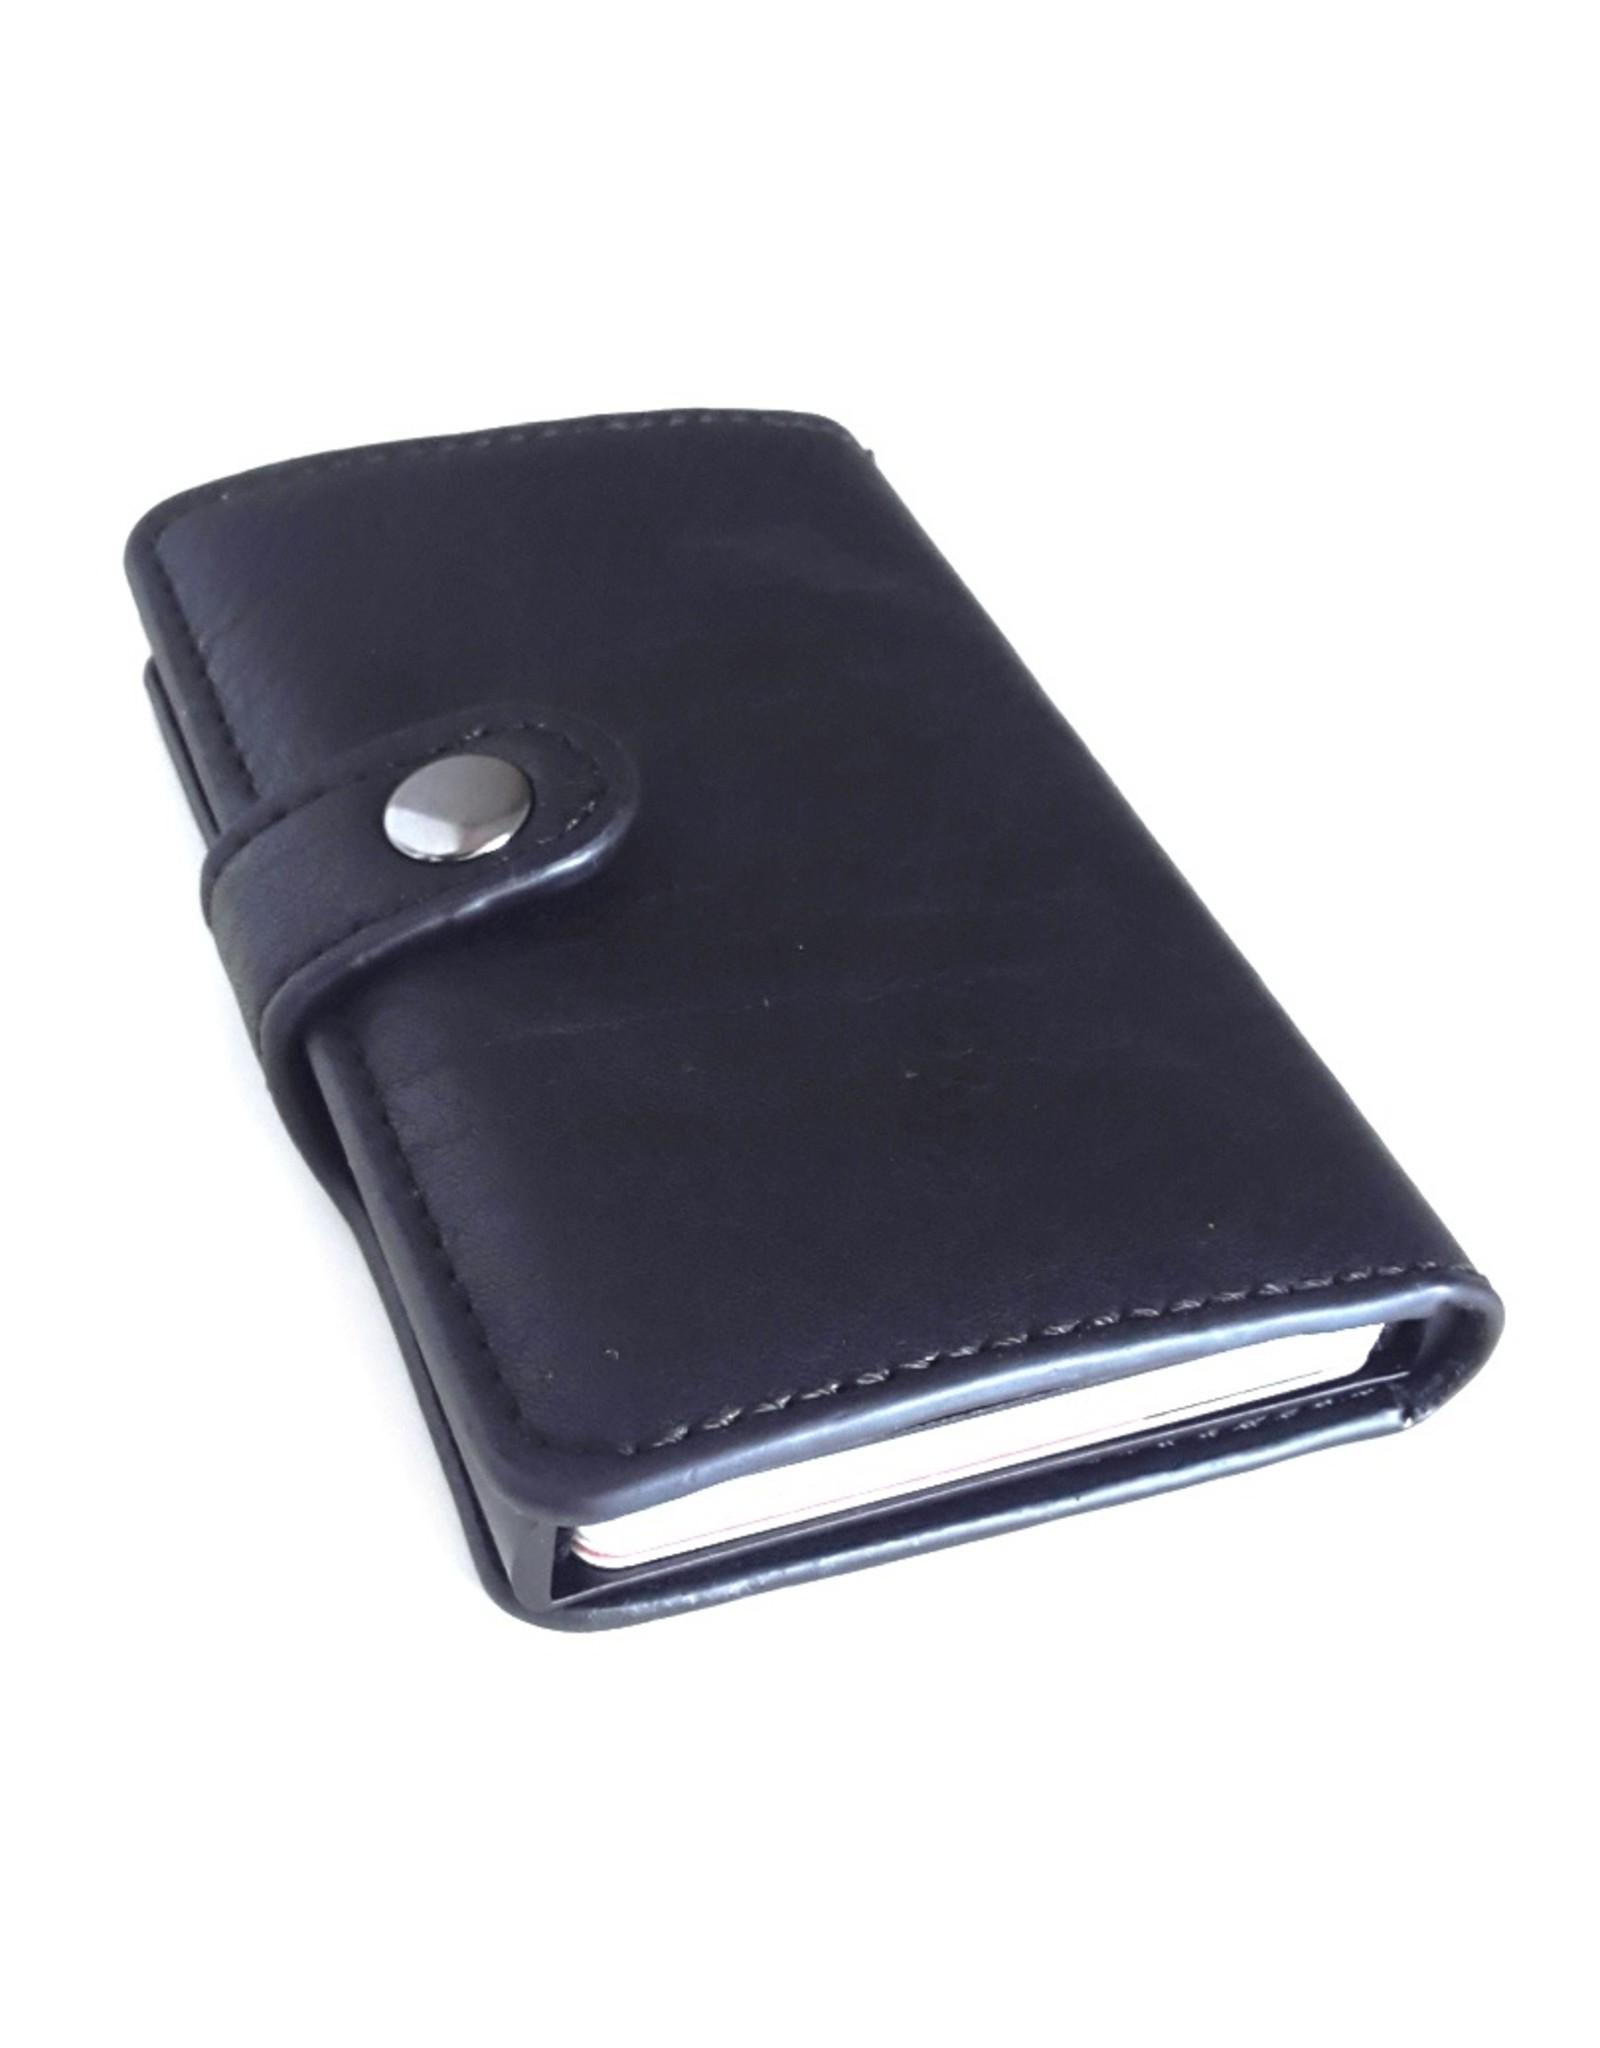 Hütmann Avond tassen, Clutches en Portemonnees - Miniwallet met aluminium card protector (zwart)